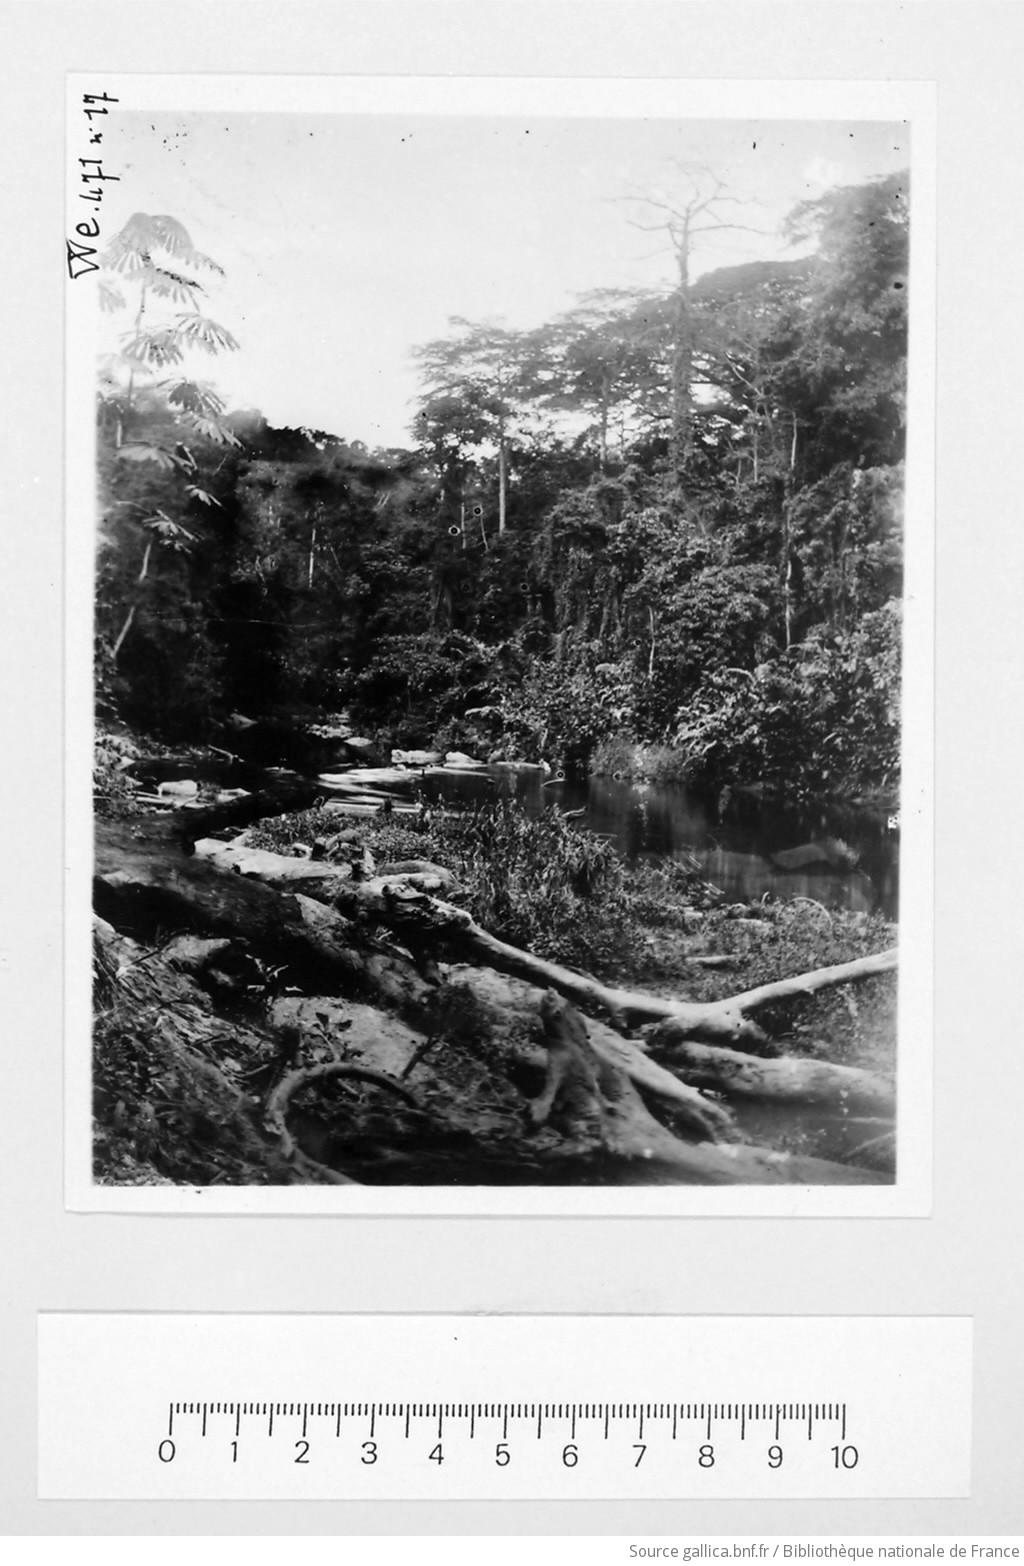 [39 phot. d'A.E.F. en 1924. Enregistré en 1936] - 17